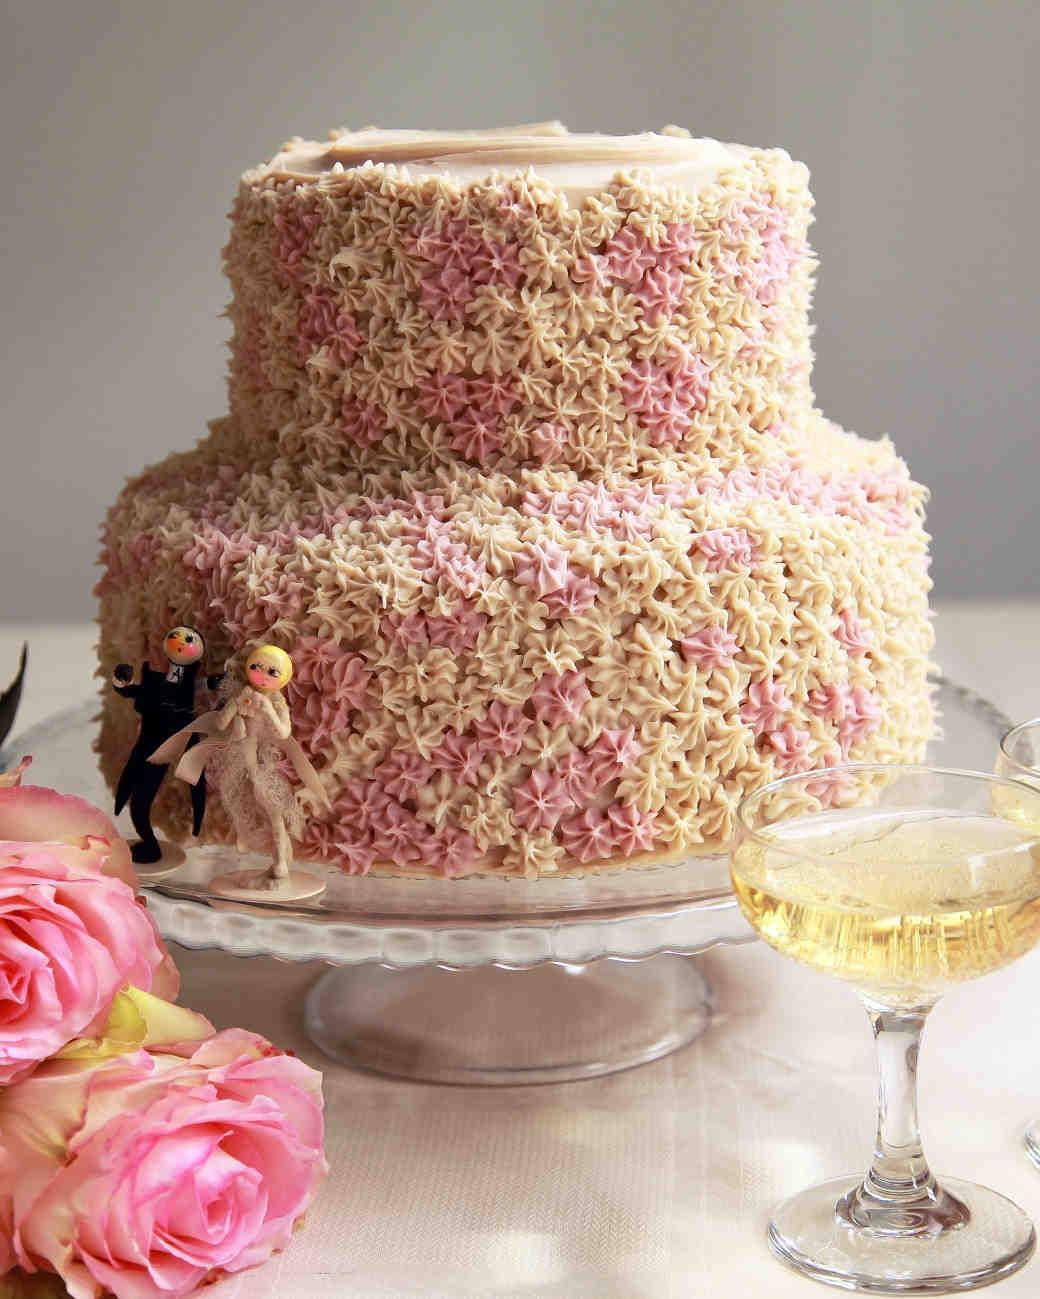 Vegan Wedding Cakes  7 Delicious Vegan Wedding Cakes